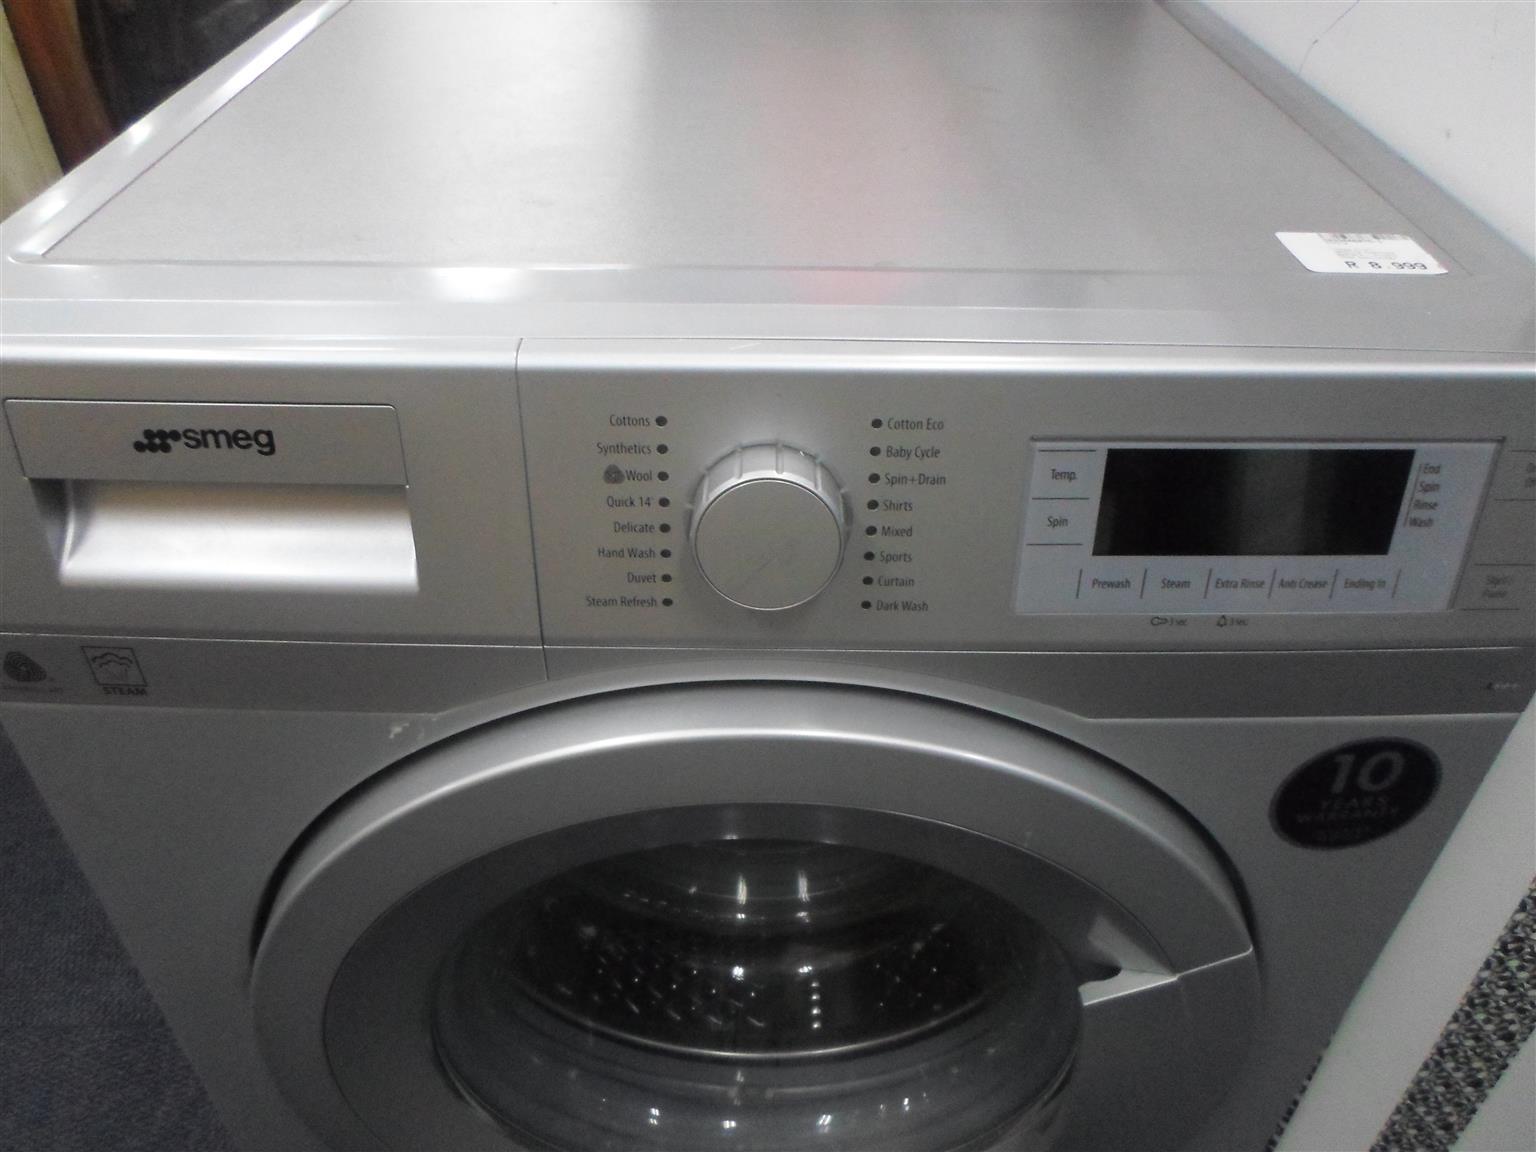 Smeg Washing Machine - C033046975-1